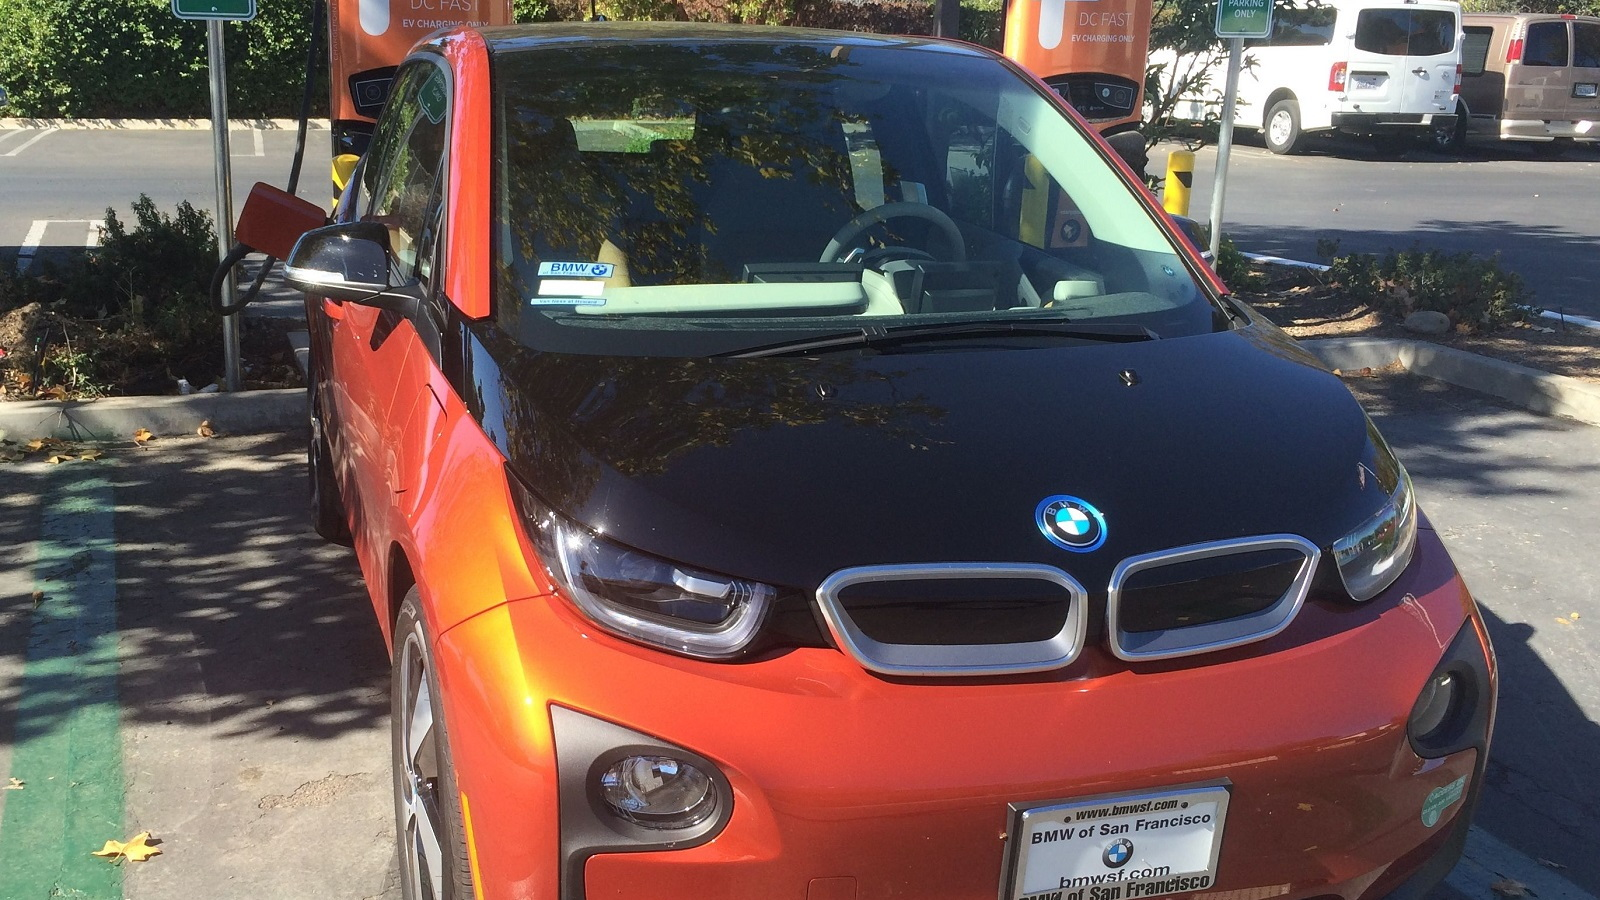 2015 BMW i3 REx fast-charging at Marriott Inn, Santa Ynez, California   [photo: Jeff Pantukhoff]